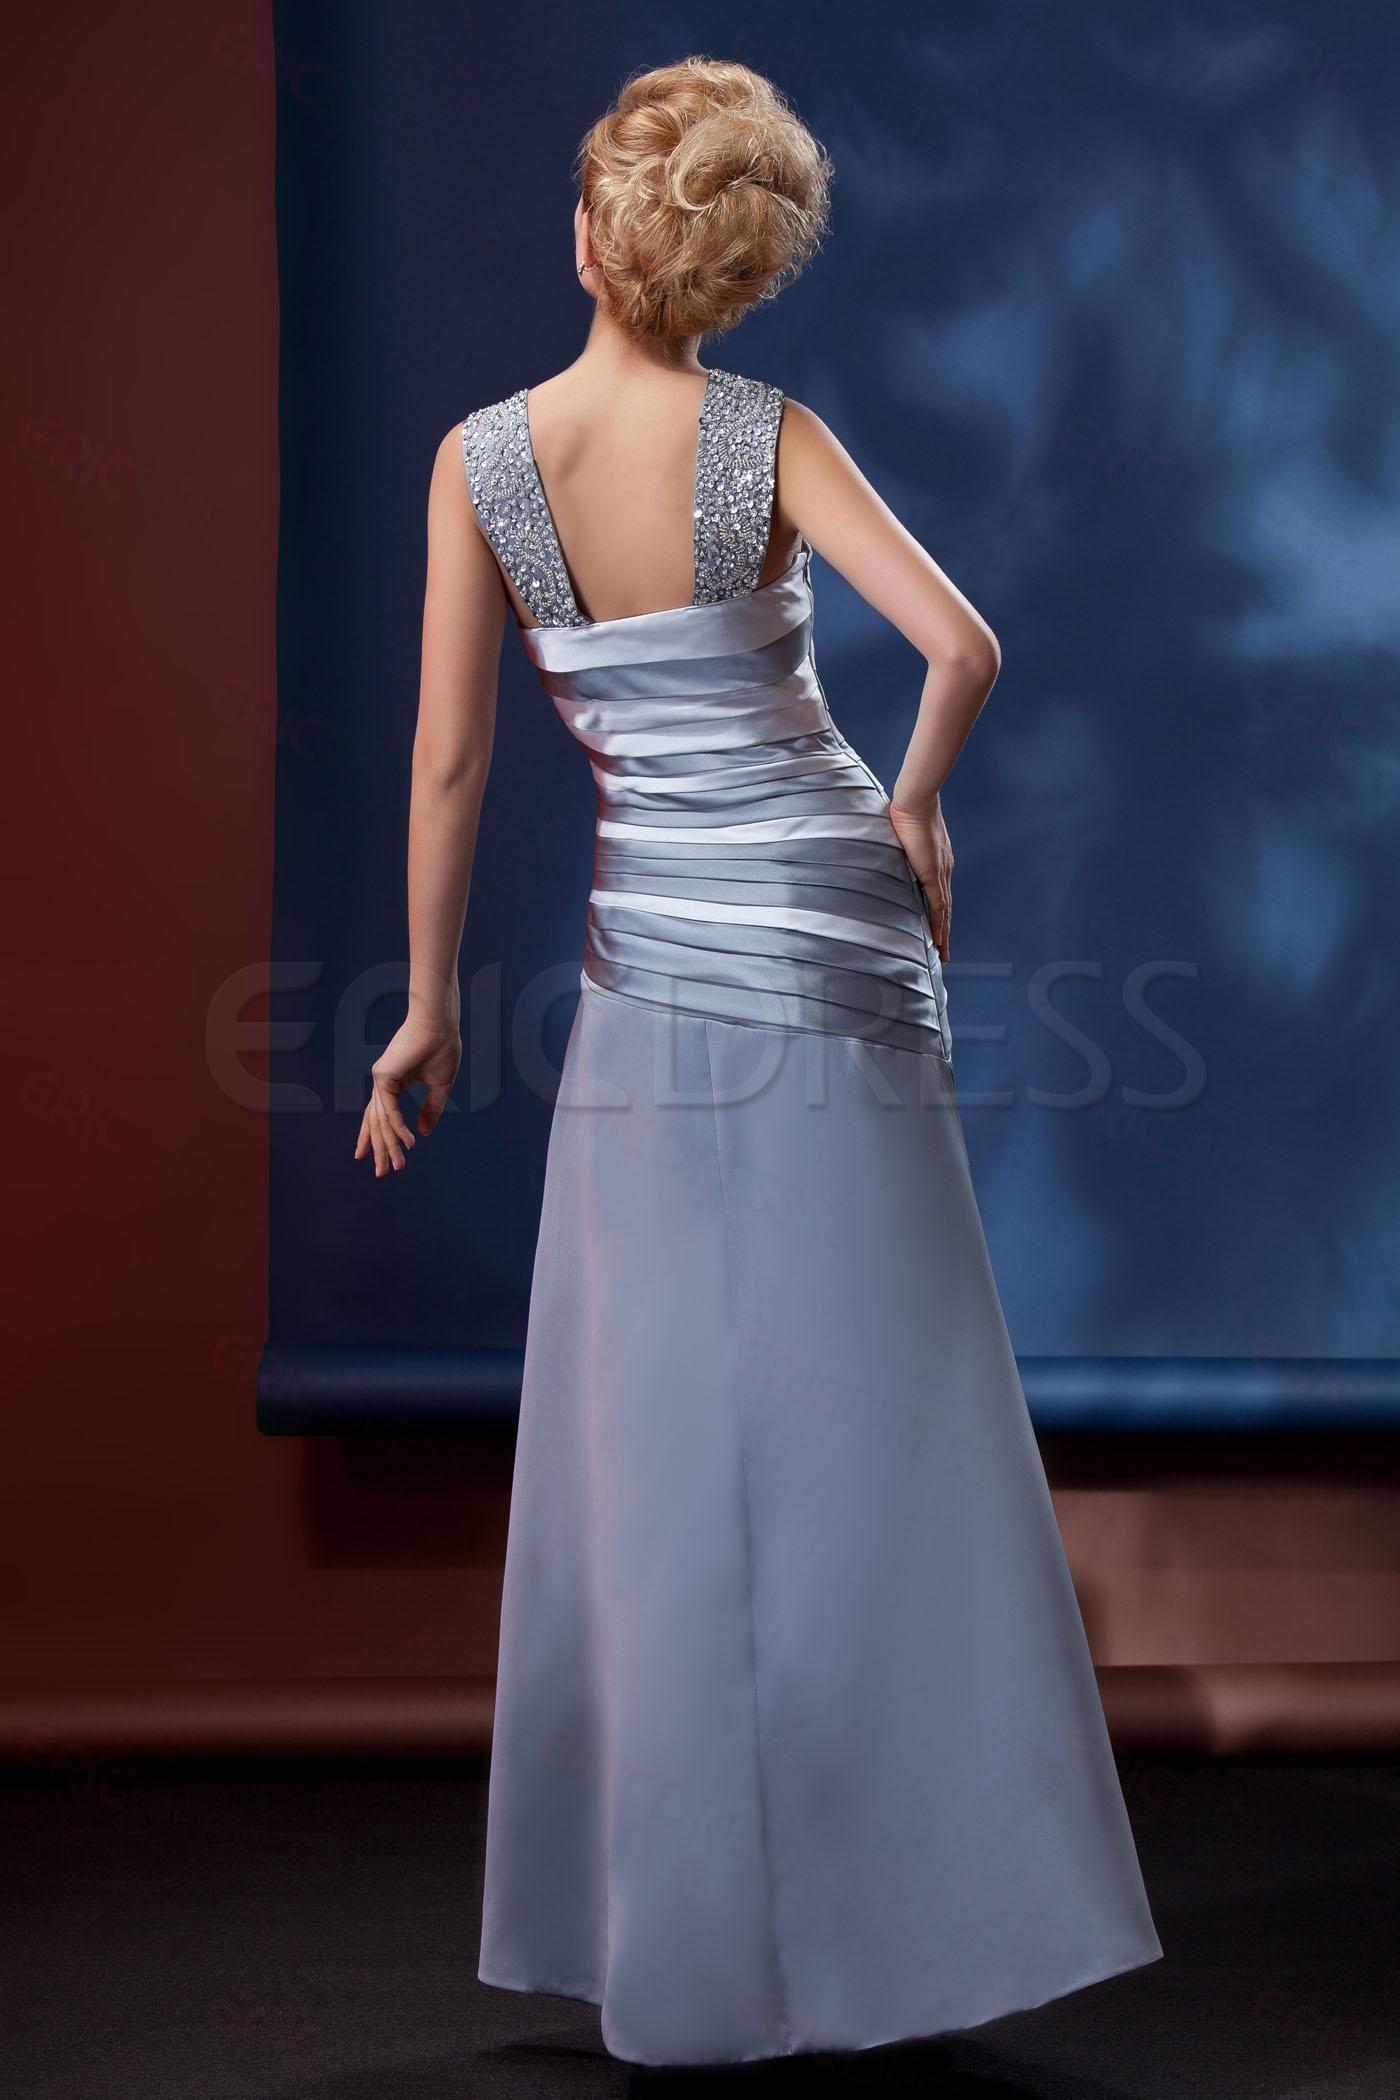 Plus size jacket dress for wedding  Beaded Sleeveless VNeck ALine Alinaus Mother of the Bride Dress